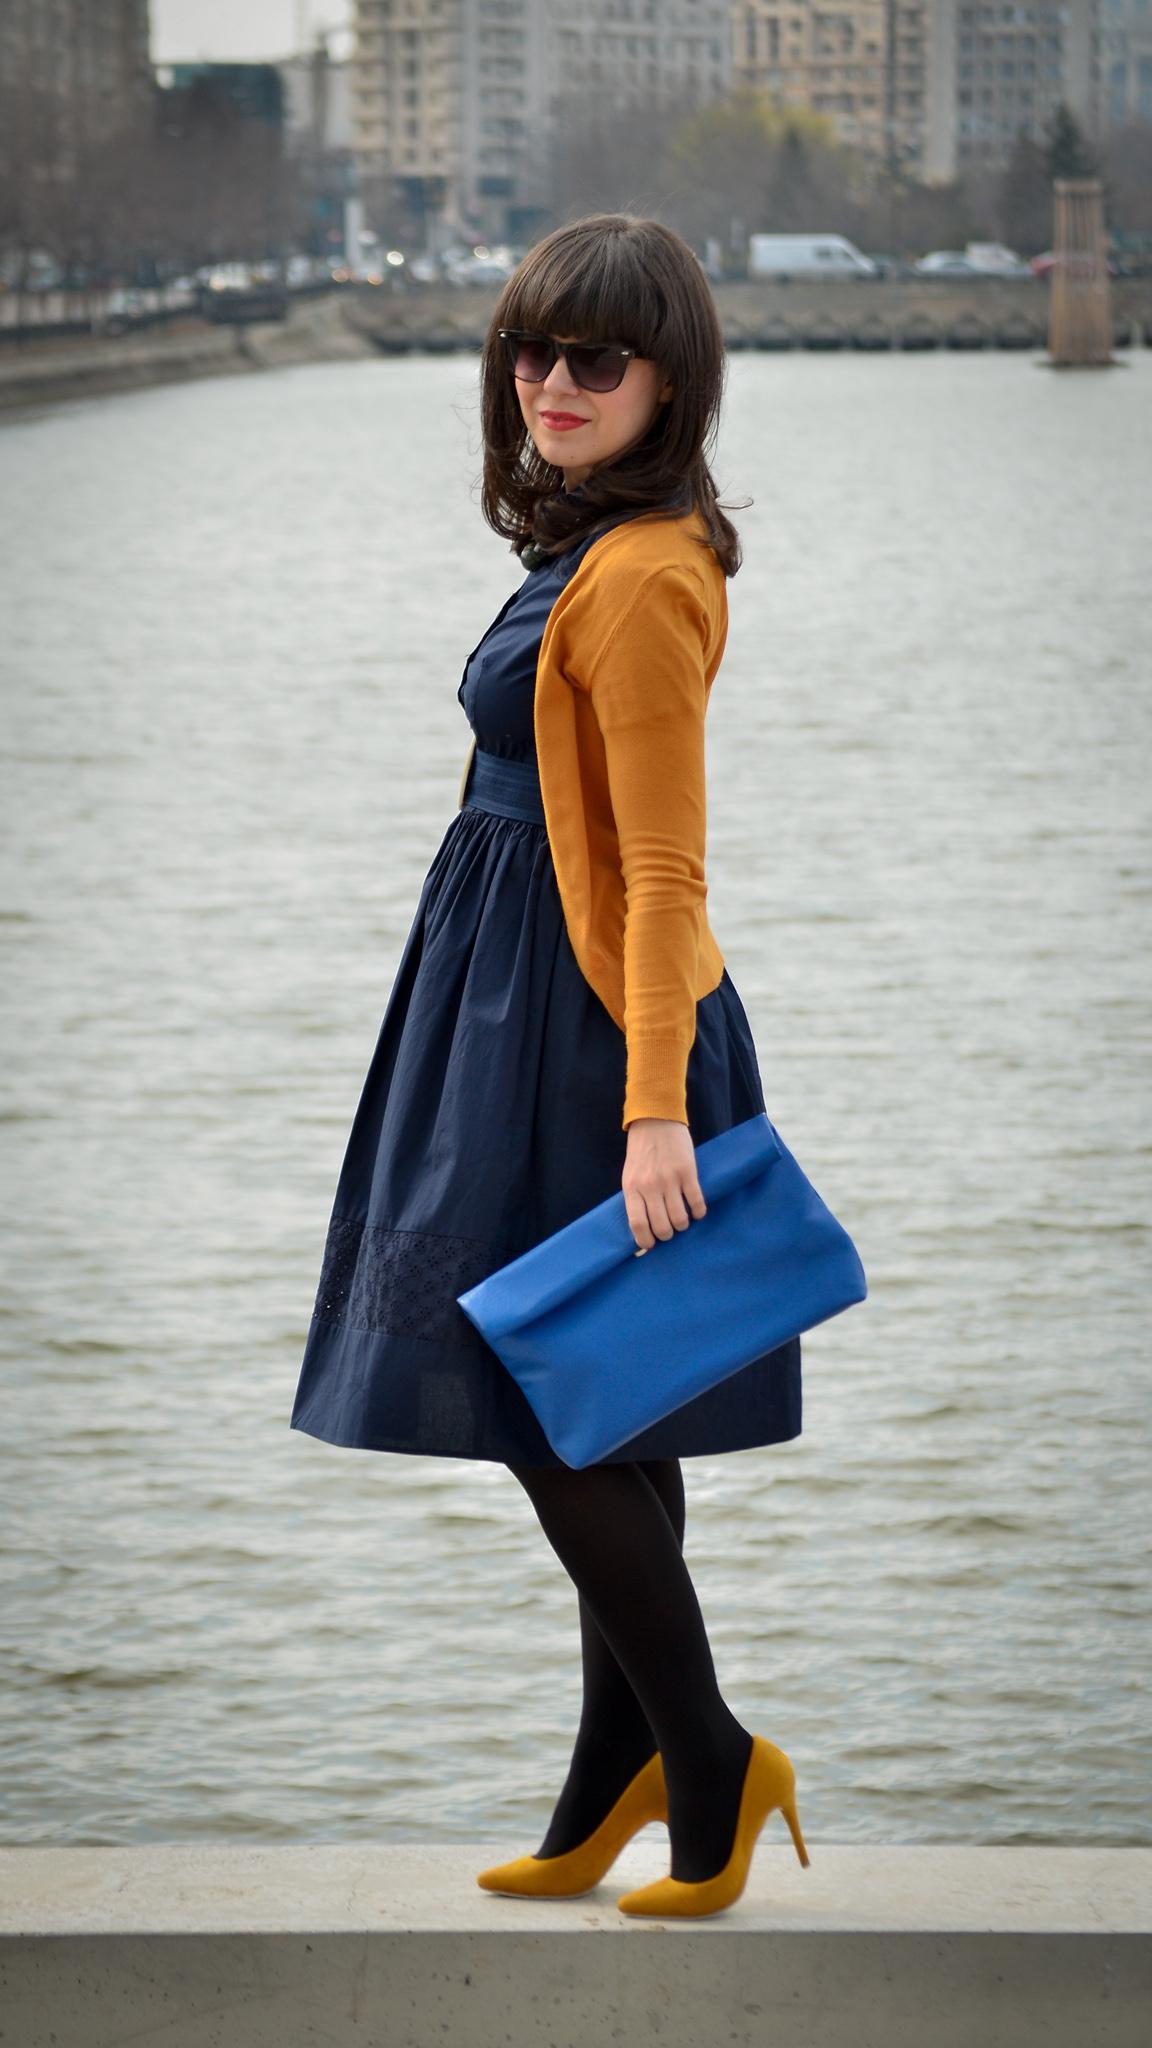 05e55d9c059 spring outfit navy dress 50s style mustard cardigan c a thrifted belt  cobalt blue clutch new yorker